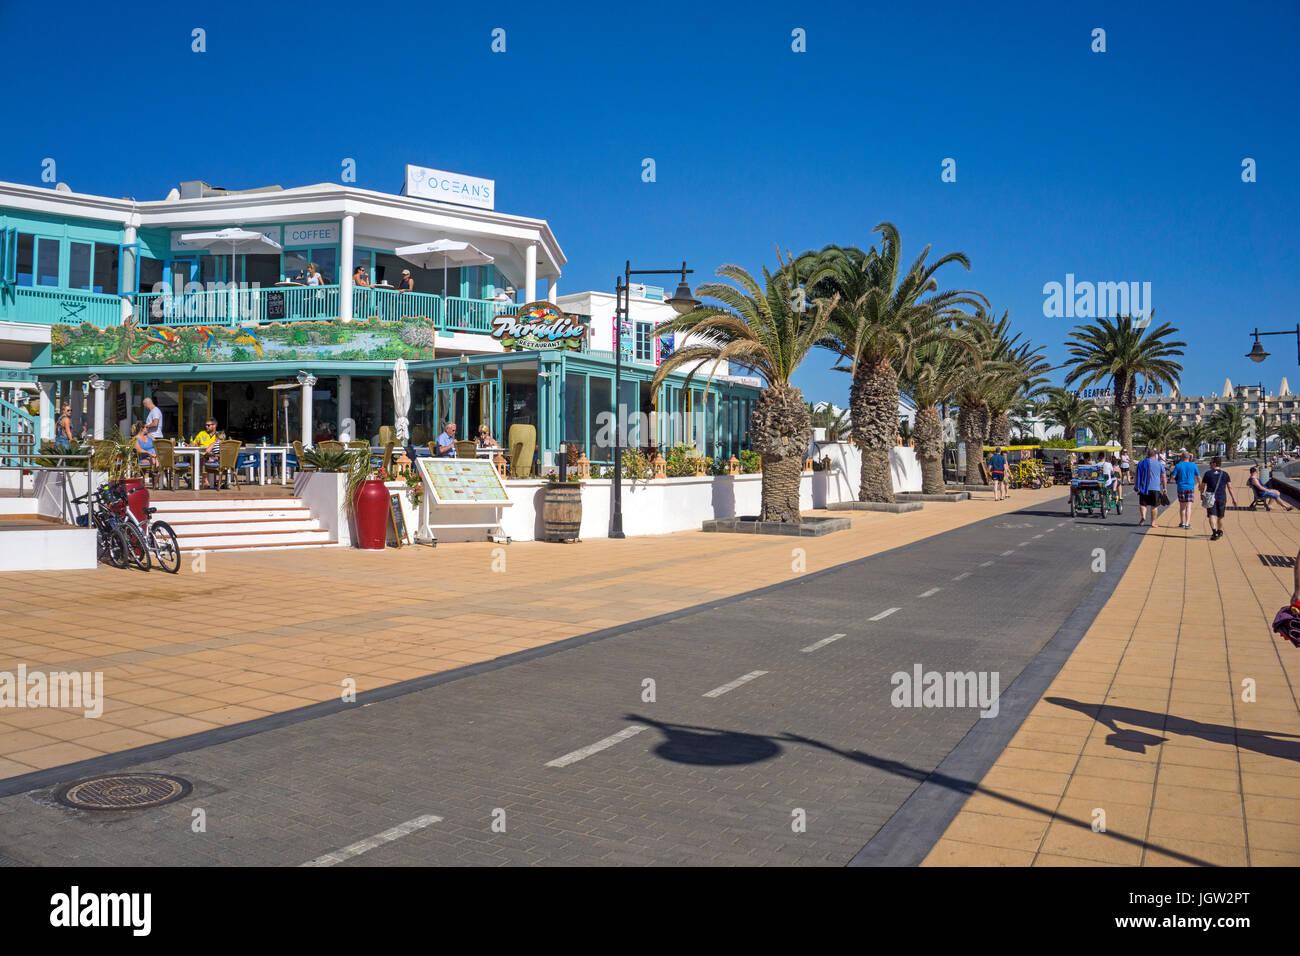 Promenade and cycleway at Playa Matagorda, Puerto del Carmen, Lanzarote island, Canary islands, Spain, Europe - Stock Image